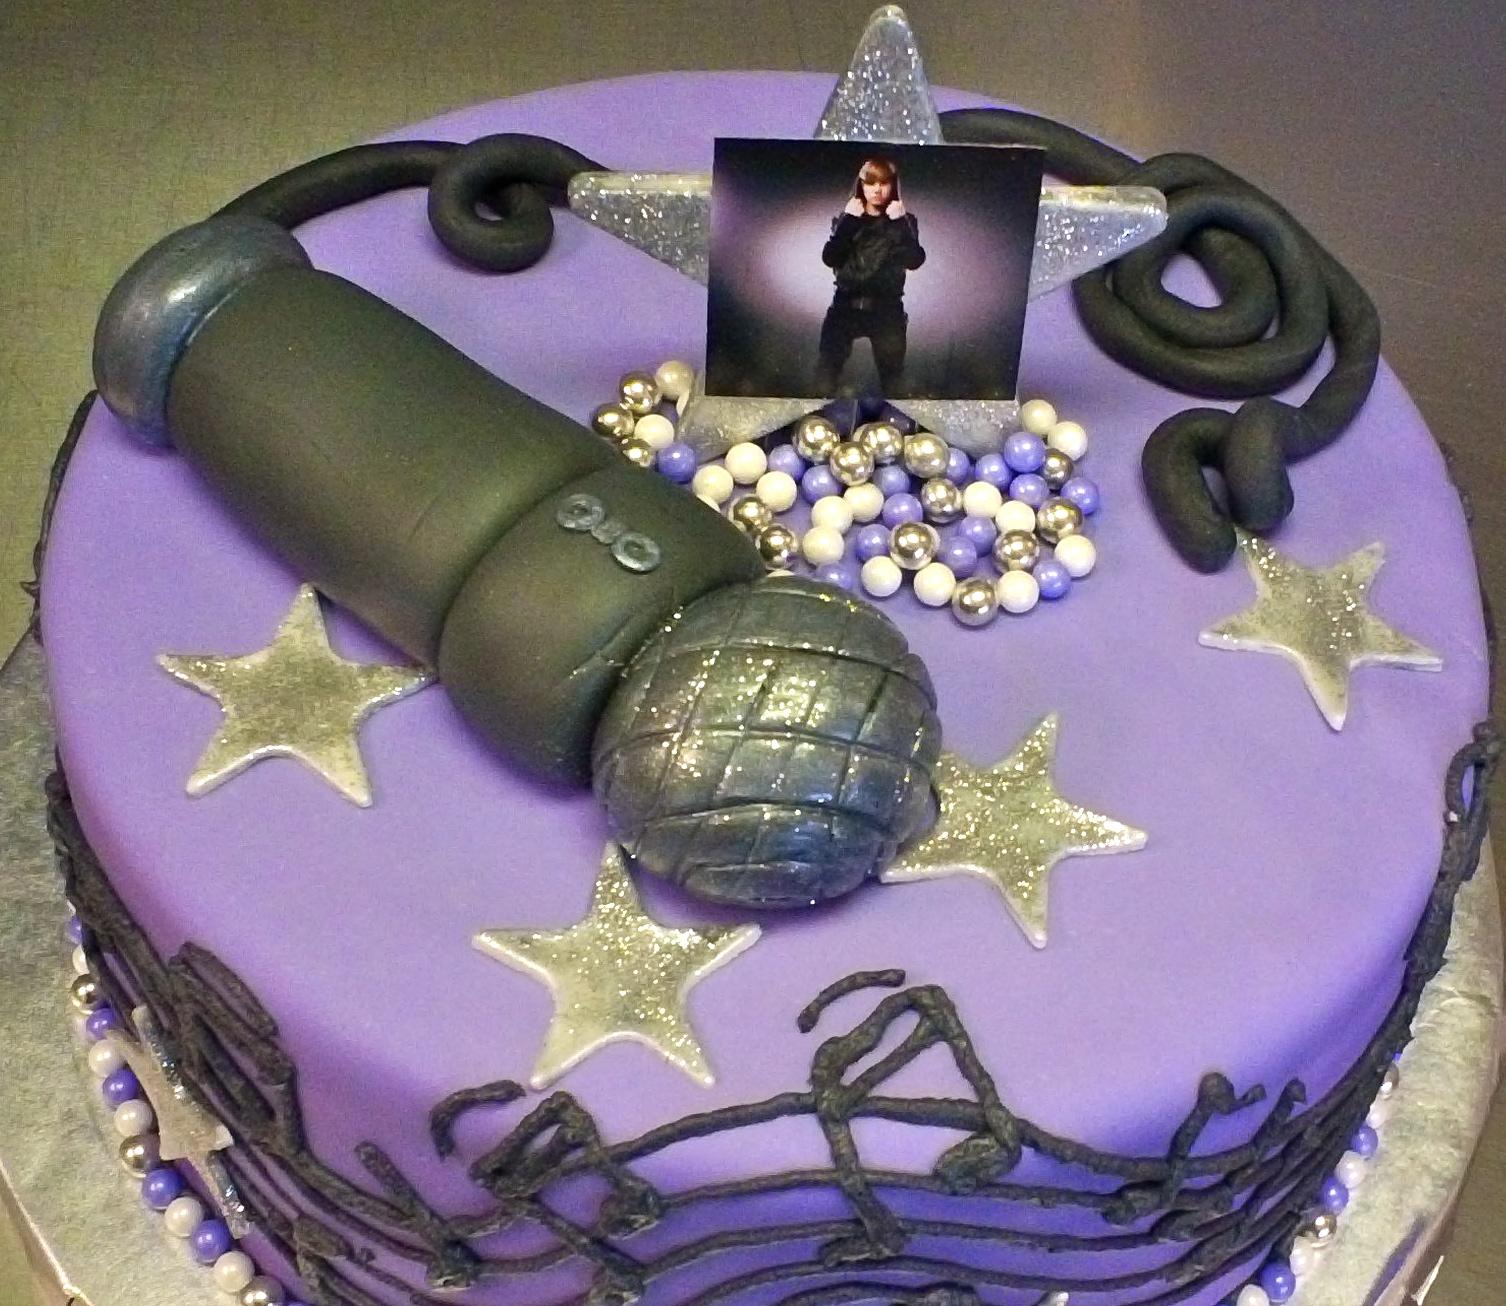 Debbies Little Cakes Bieber Fever